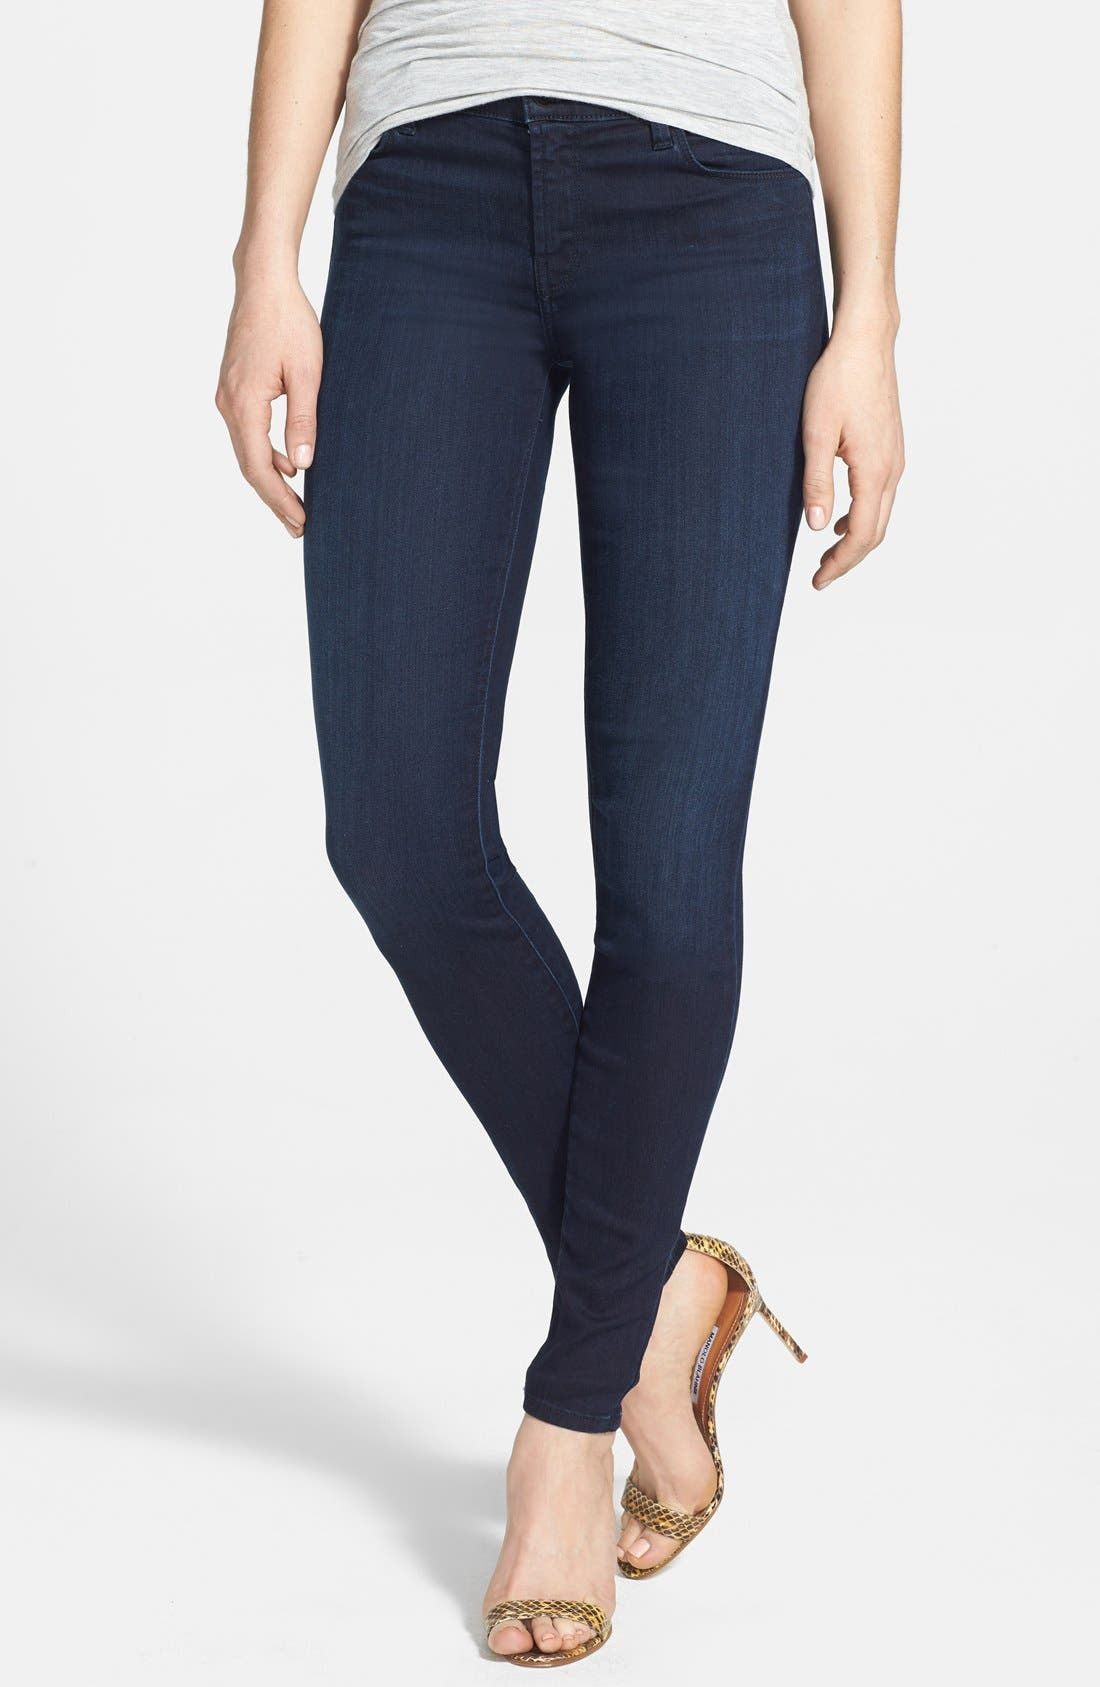 Alternate Image 1 Selected - J Brand '620' Skinny Jeans (Darkness)